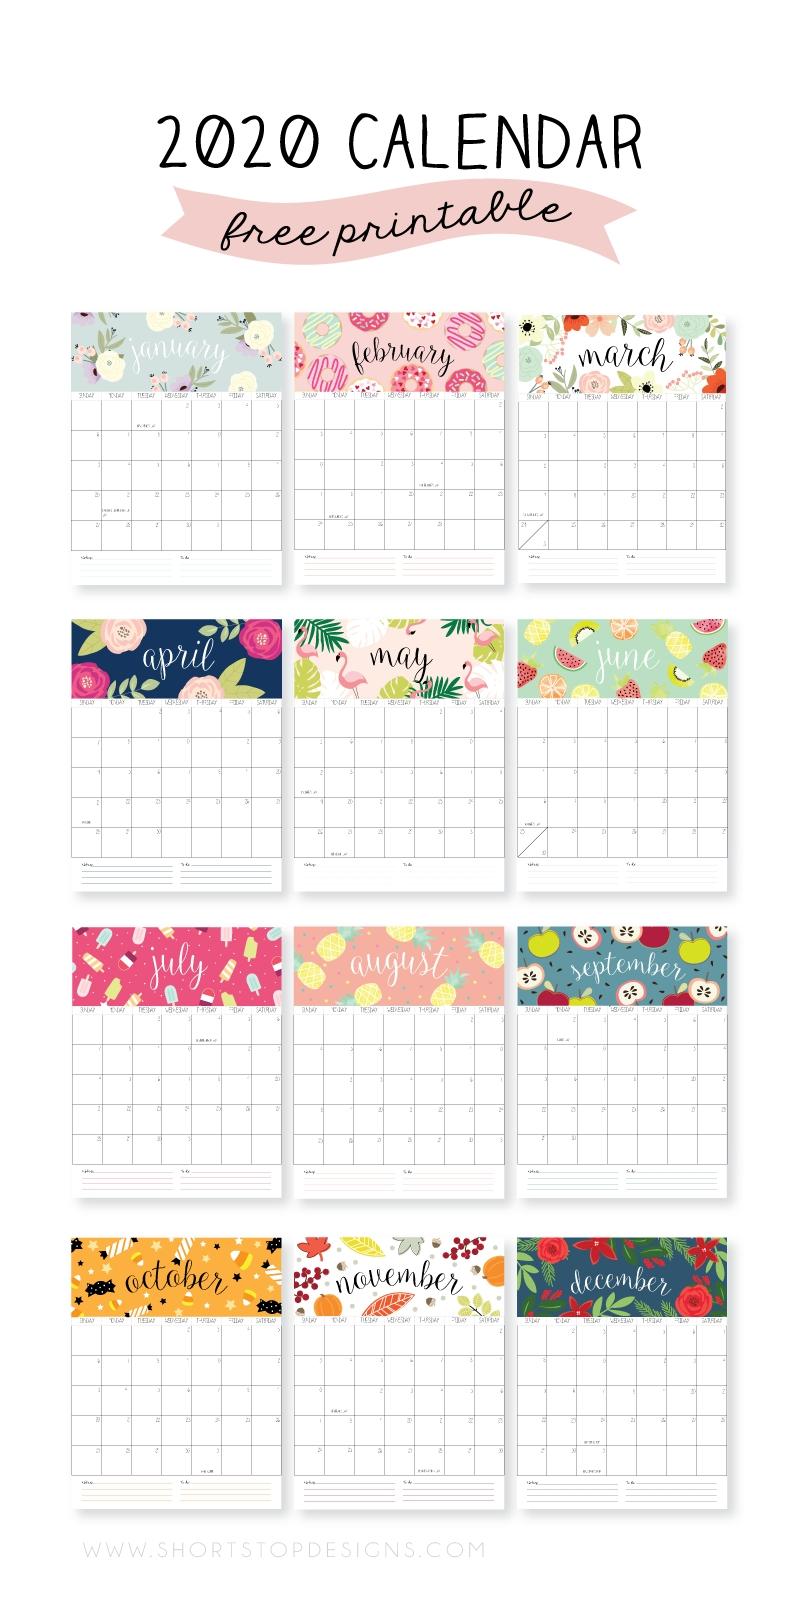 2020 Printable Calendar – Short Stop Designs